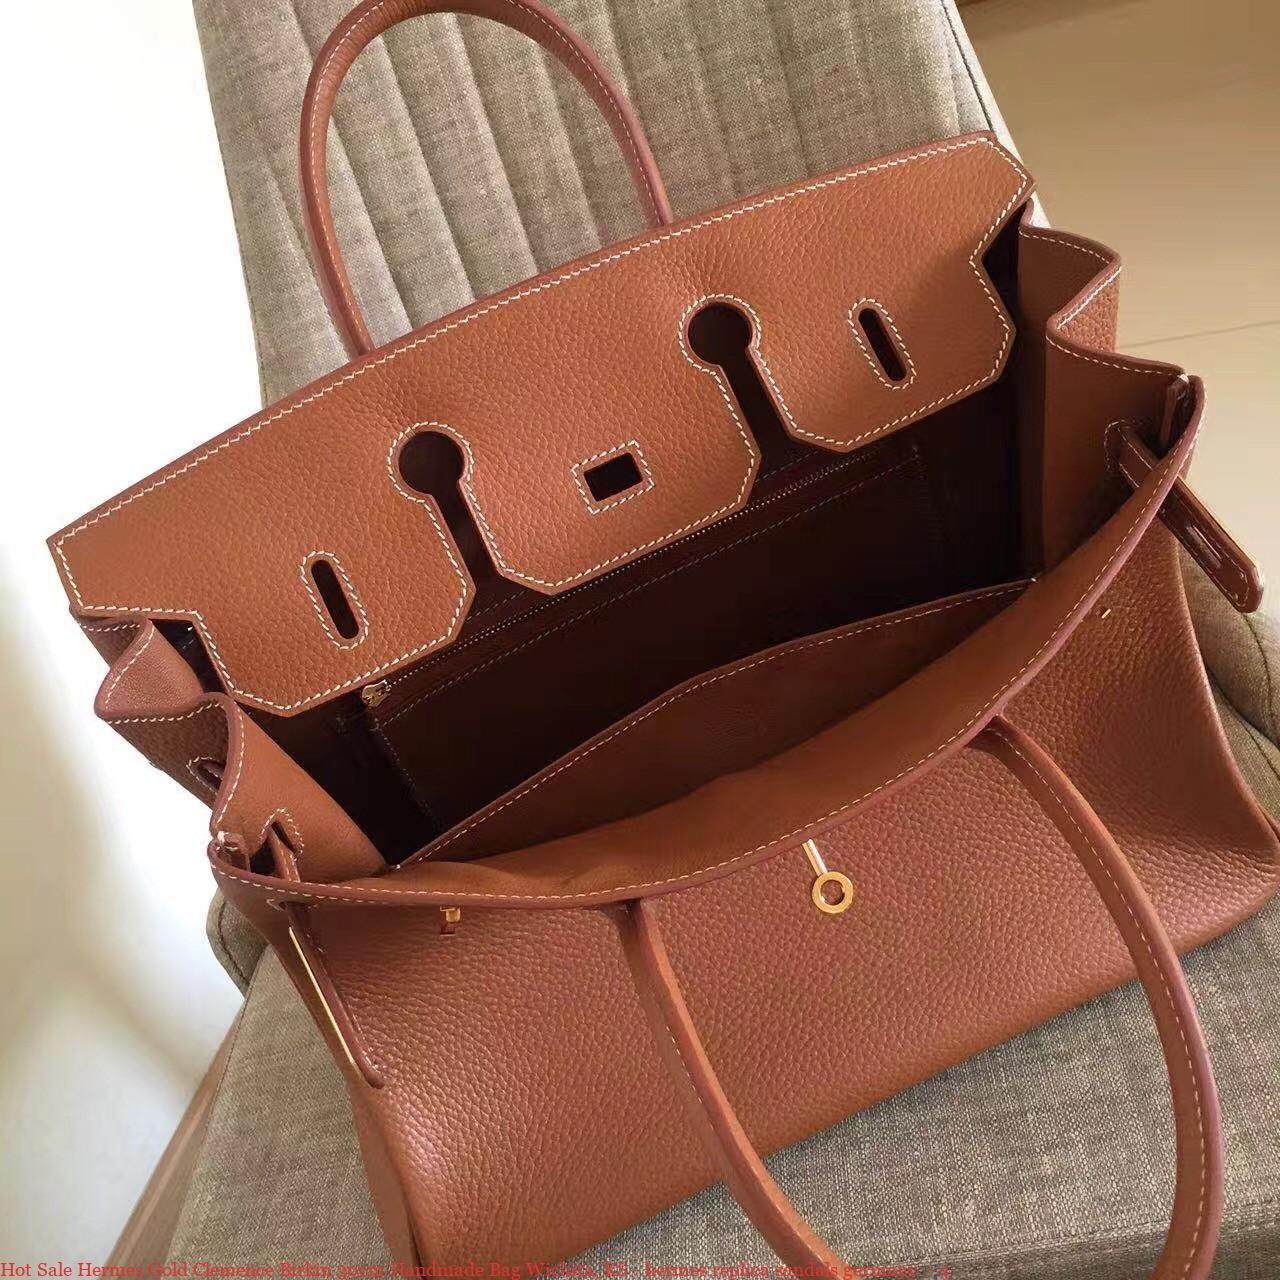 bc0408af60b6 Hot Sale Hermes Gold Clemence Birkin 30cm Handmade Bag Wichita